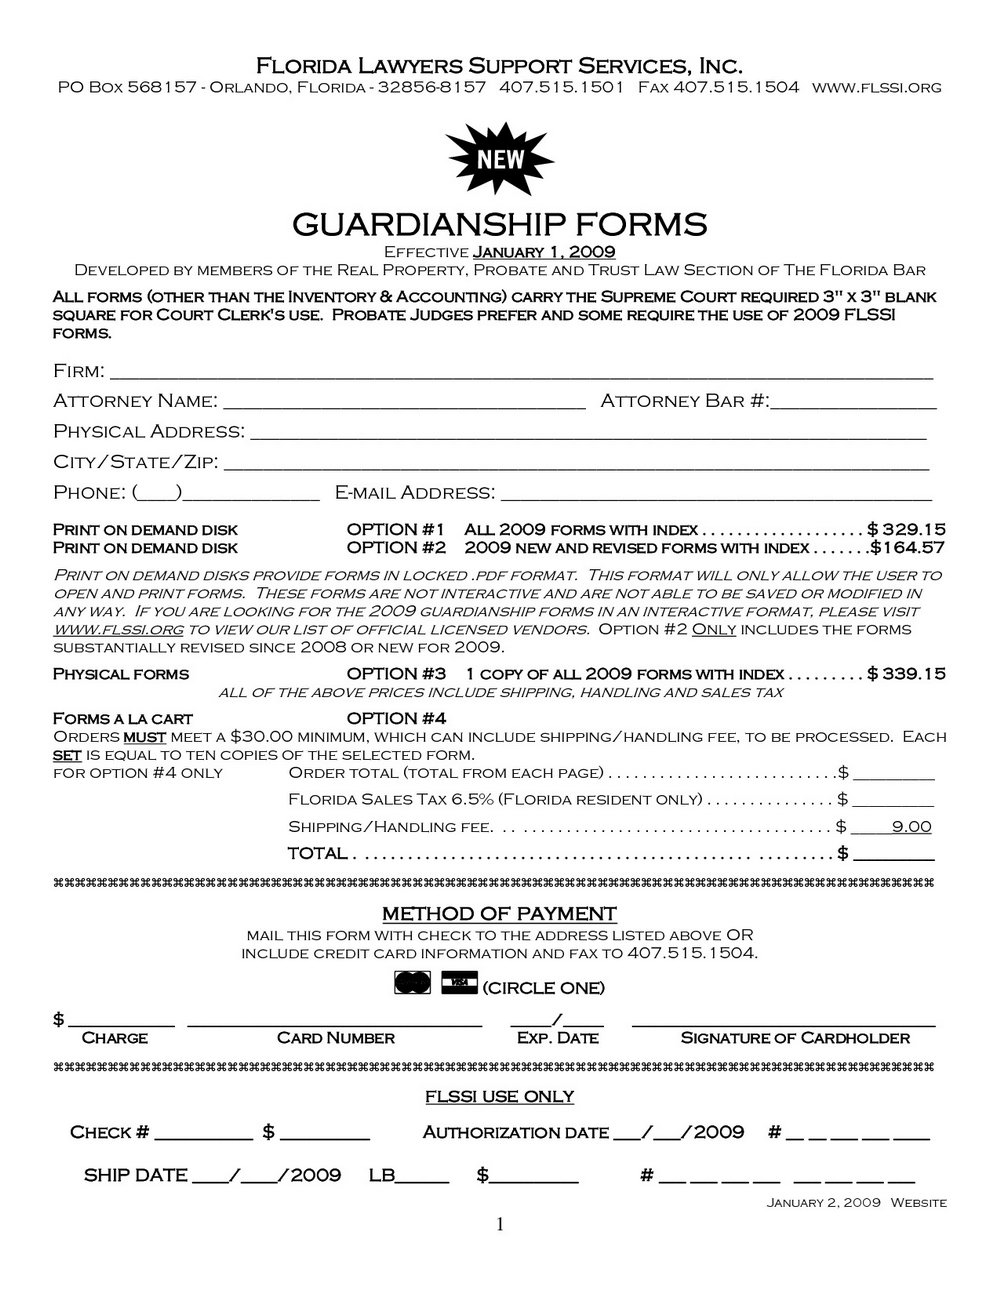 Free Temporary Guardianship Forms Arizona